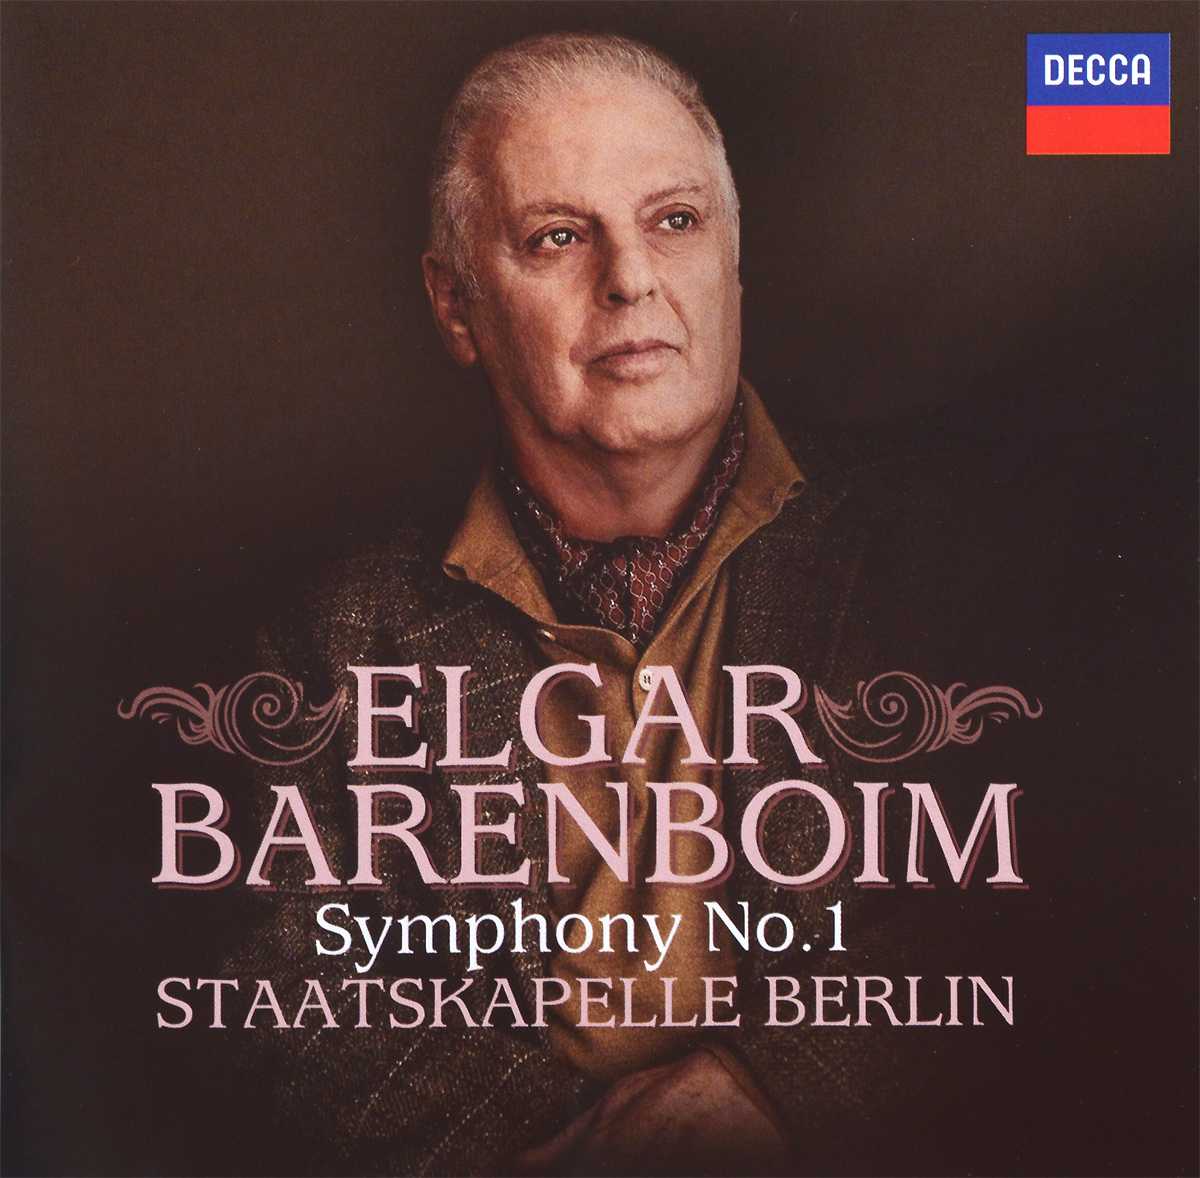 все цены на Дэниэл Баренбойм,Staatskapelle Berlin Daniel Barenboim. Elgar. Symphony No. 1 онлайн